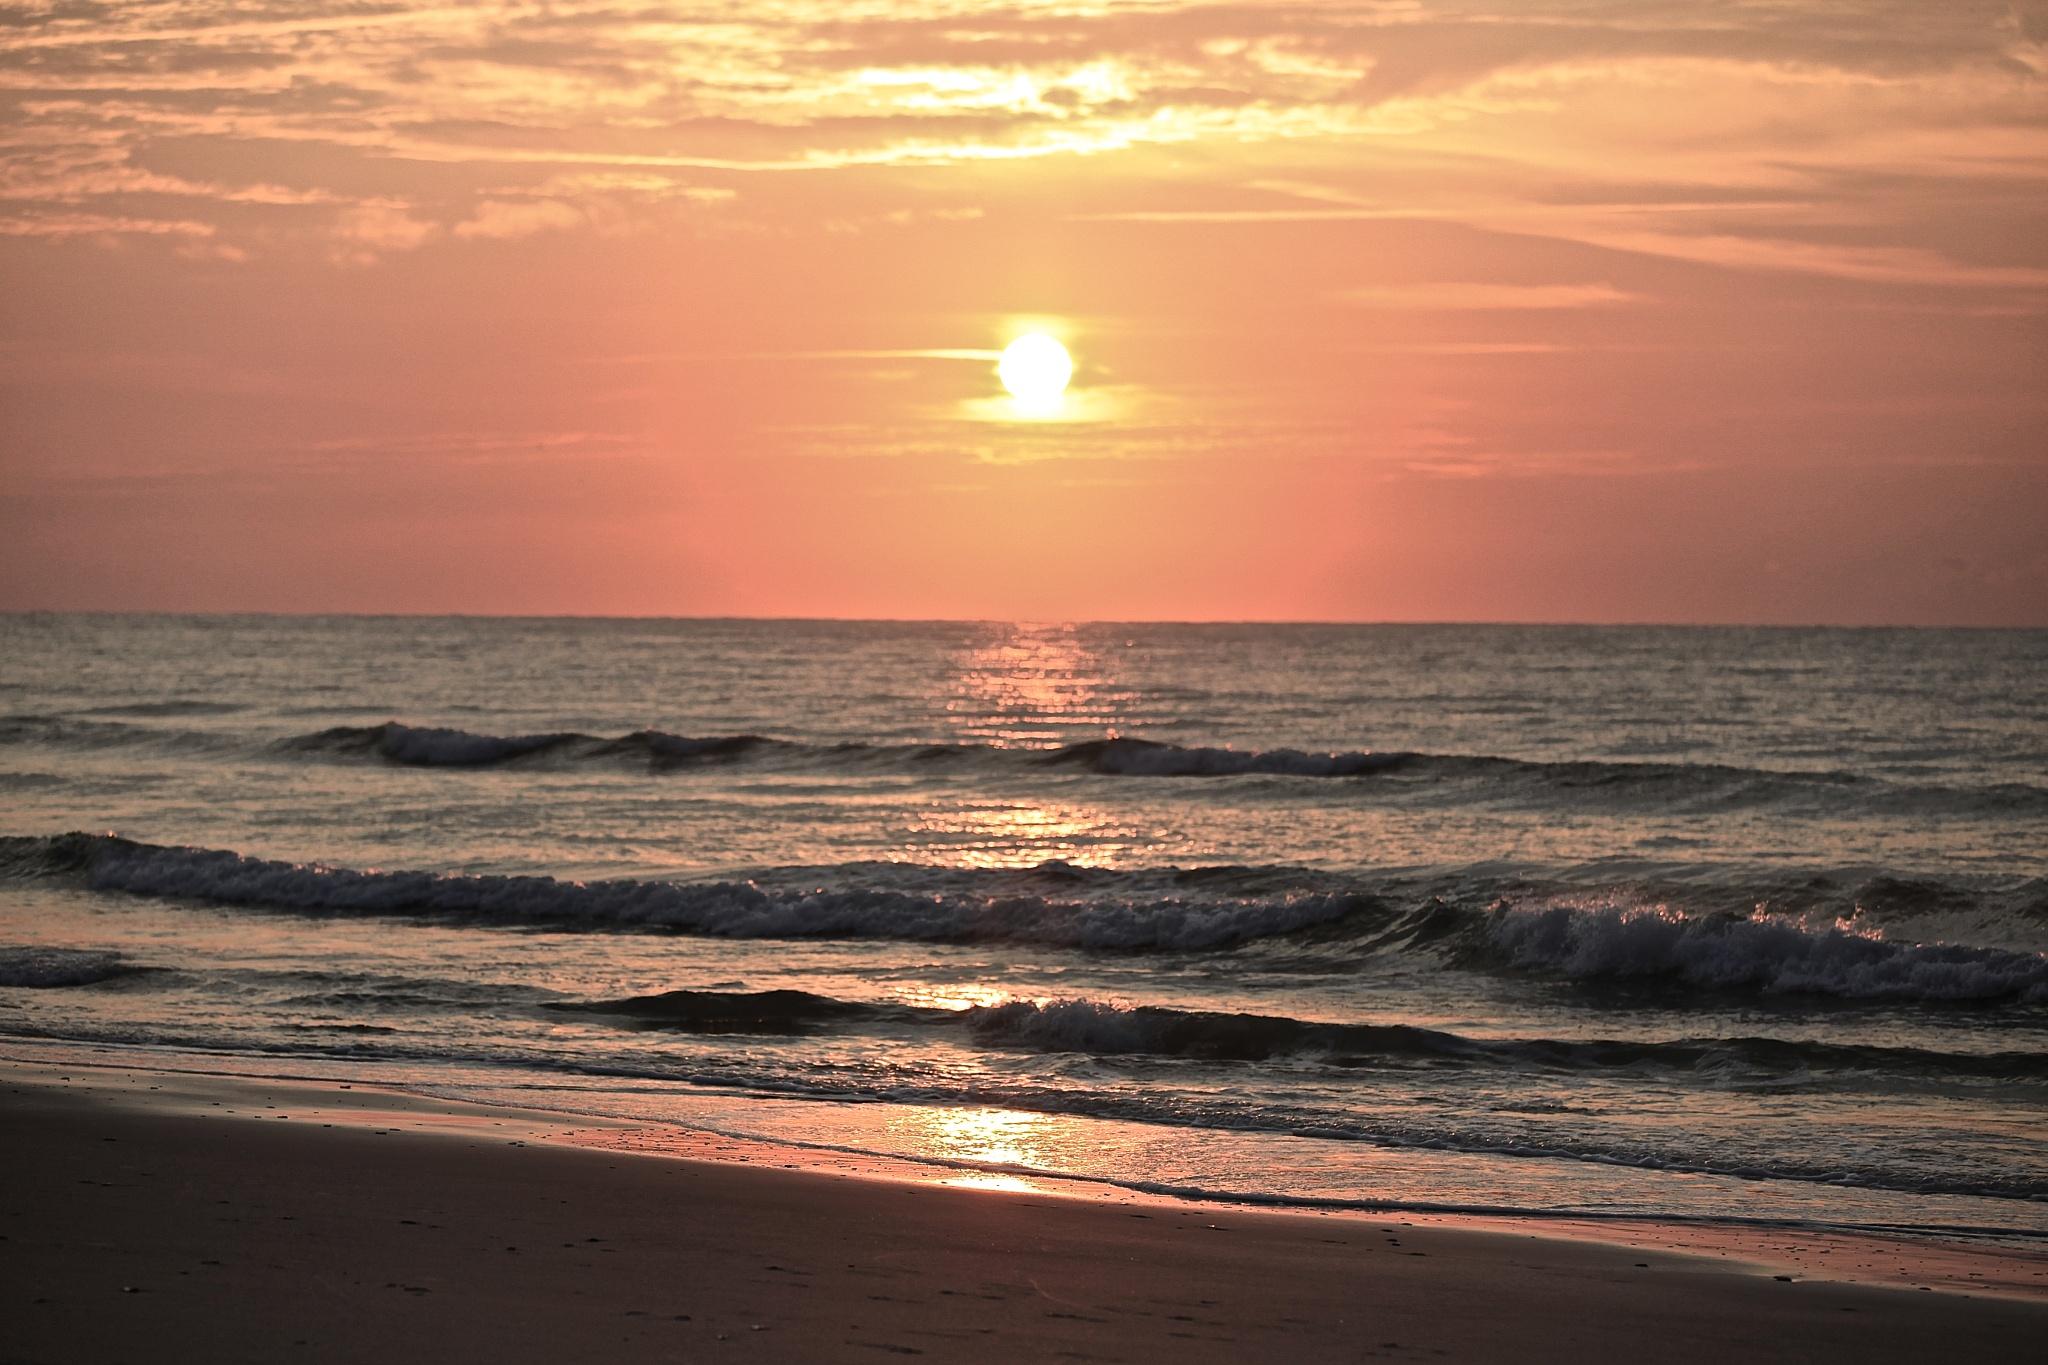 Sunrise by Tom Ratigan